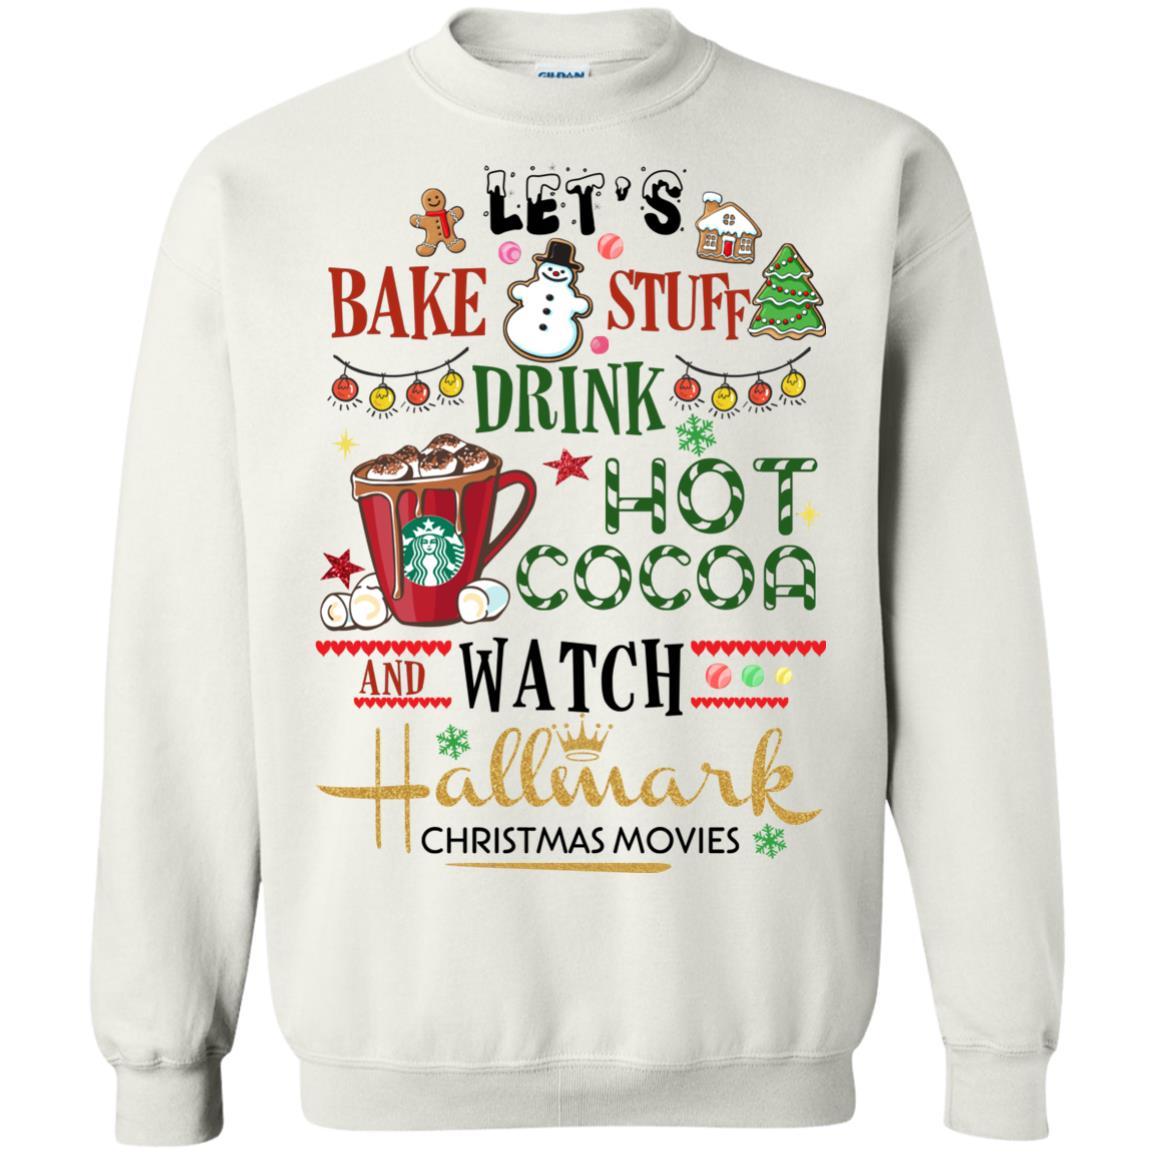 Lets Bake Stuff Drink Hot Cocoa Hallmark Christma Hoodies Shirt Hallmark Christmas Movie Watching All Day